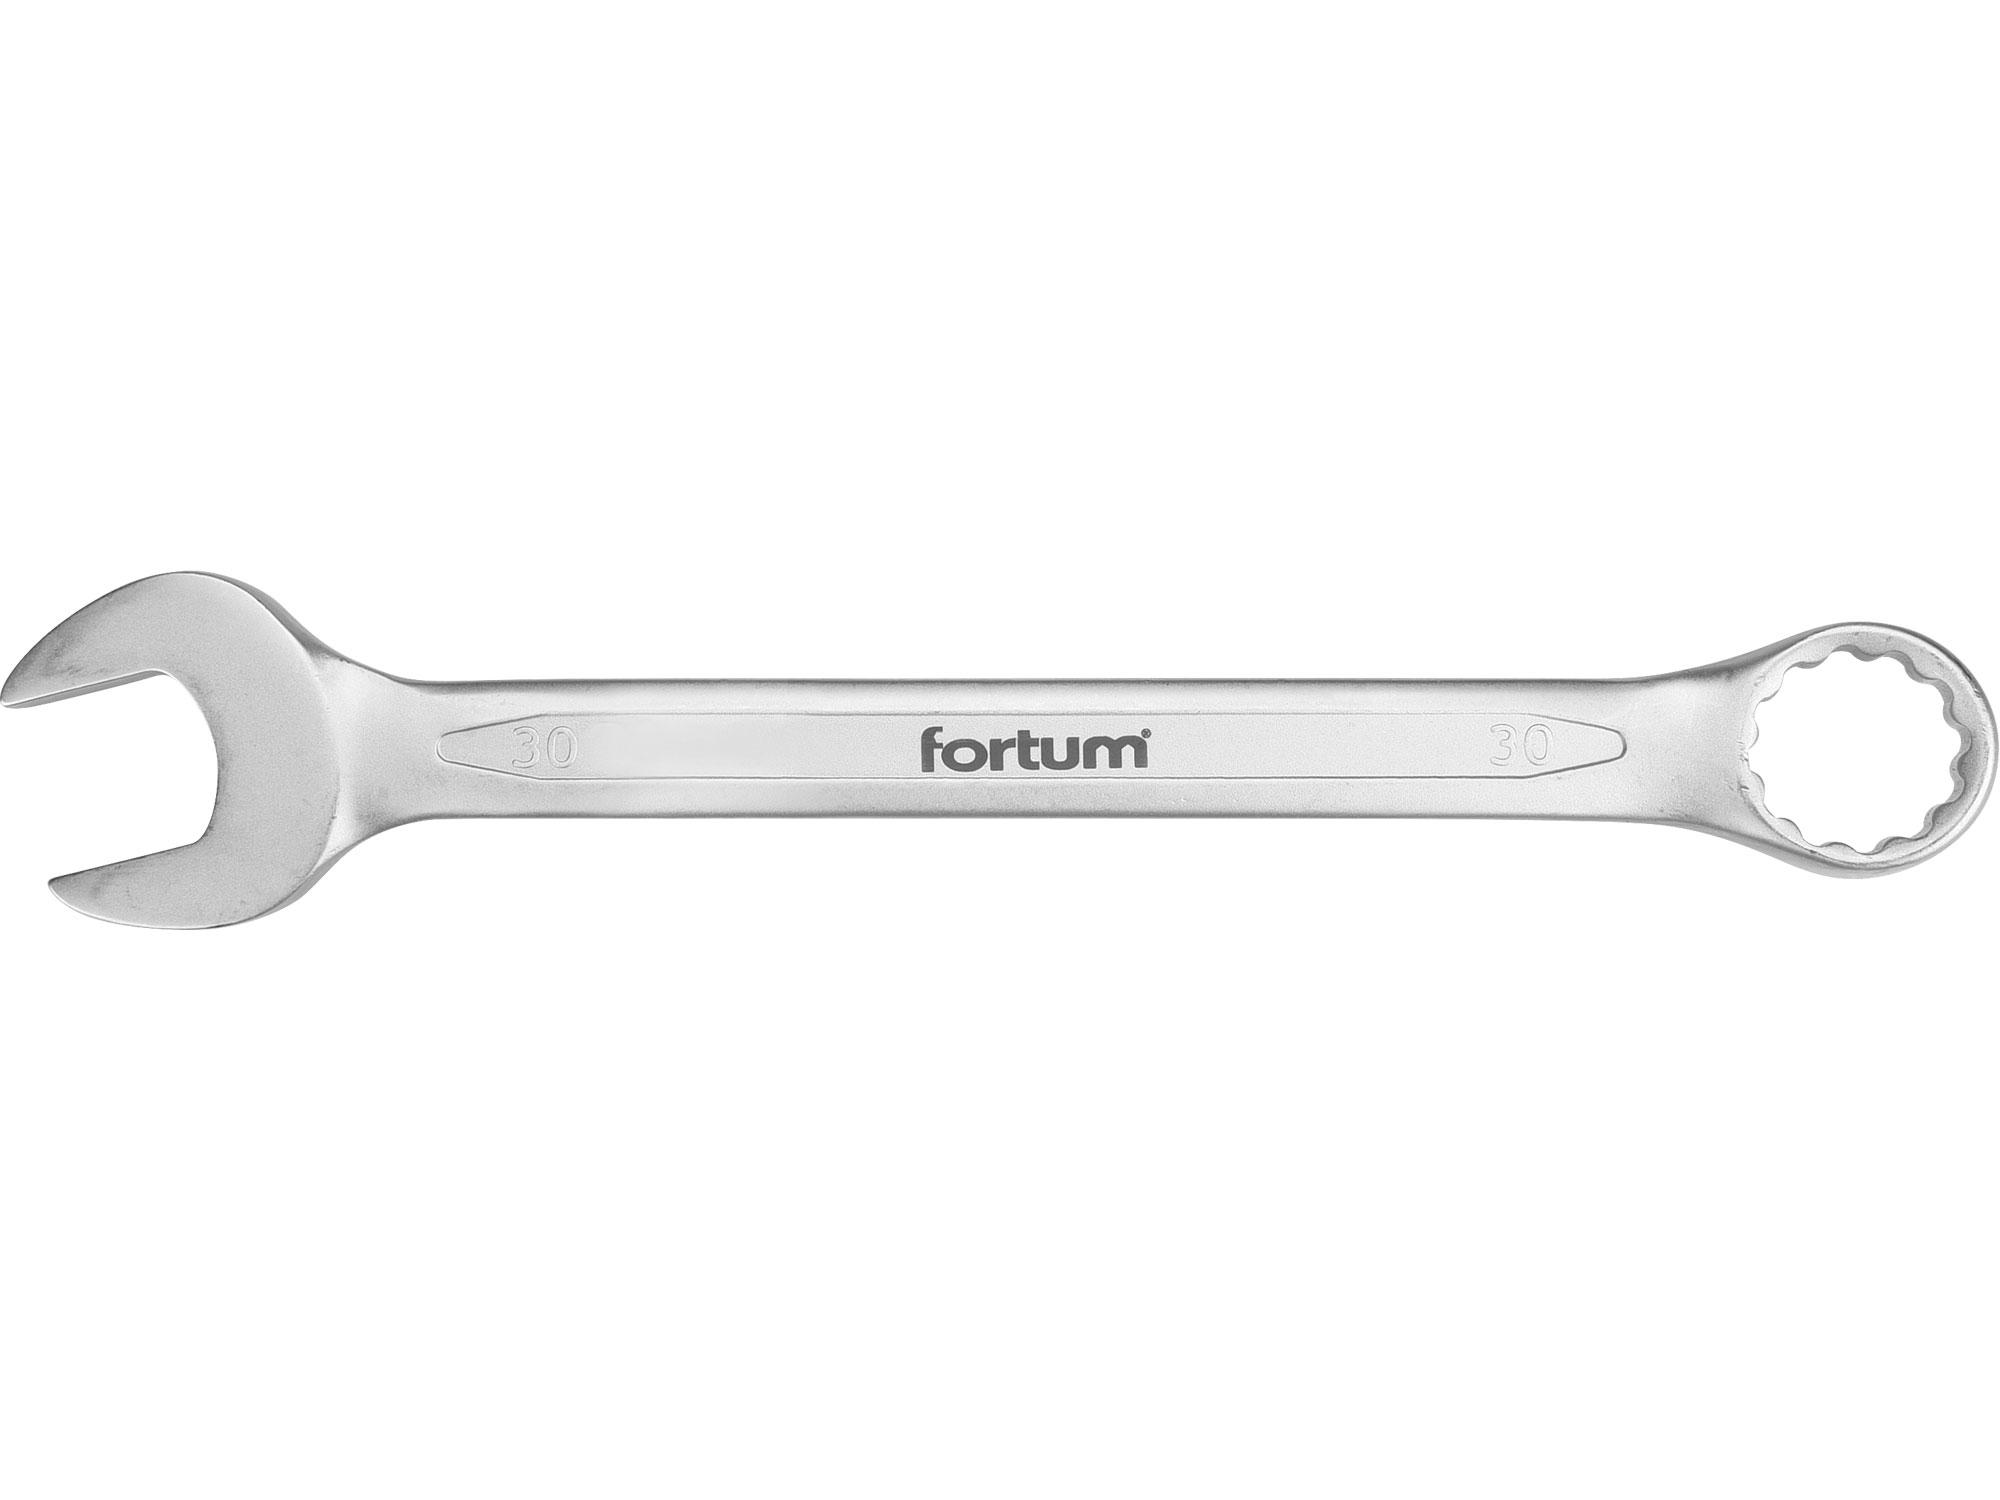 klíč očkoplochý, 30mm, L 354mm, FORTUM 4730230